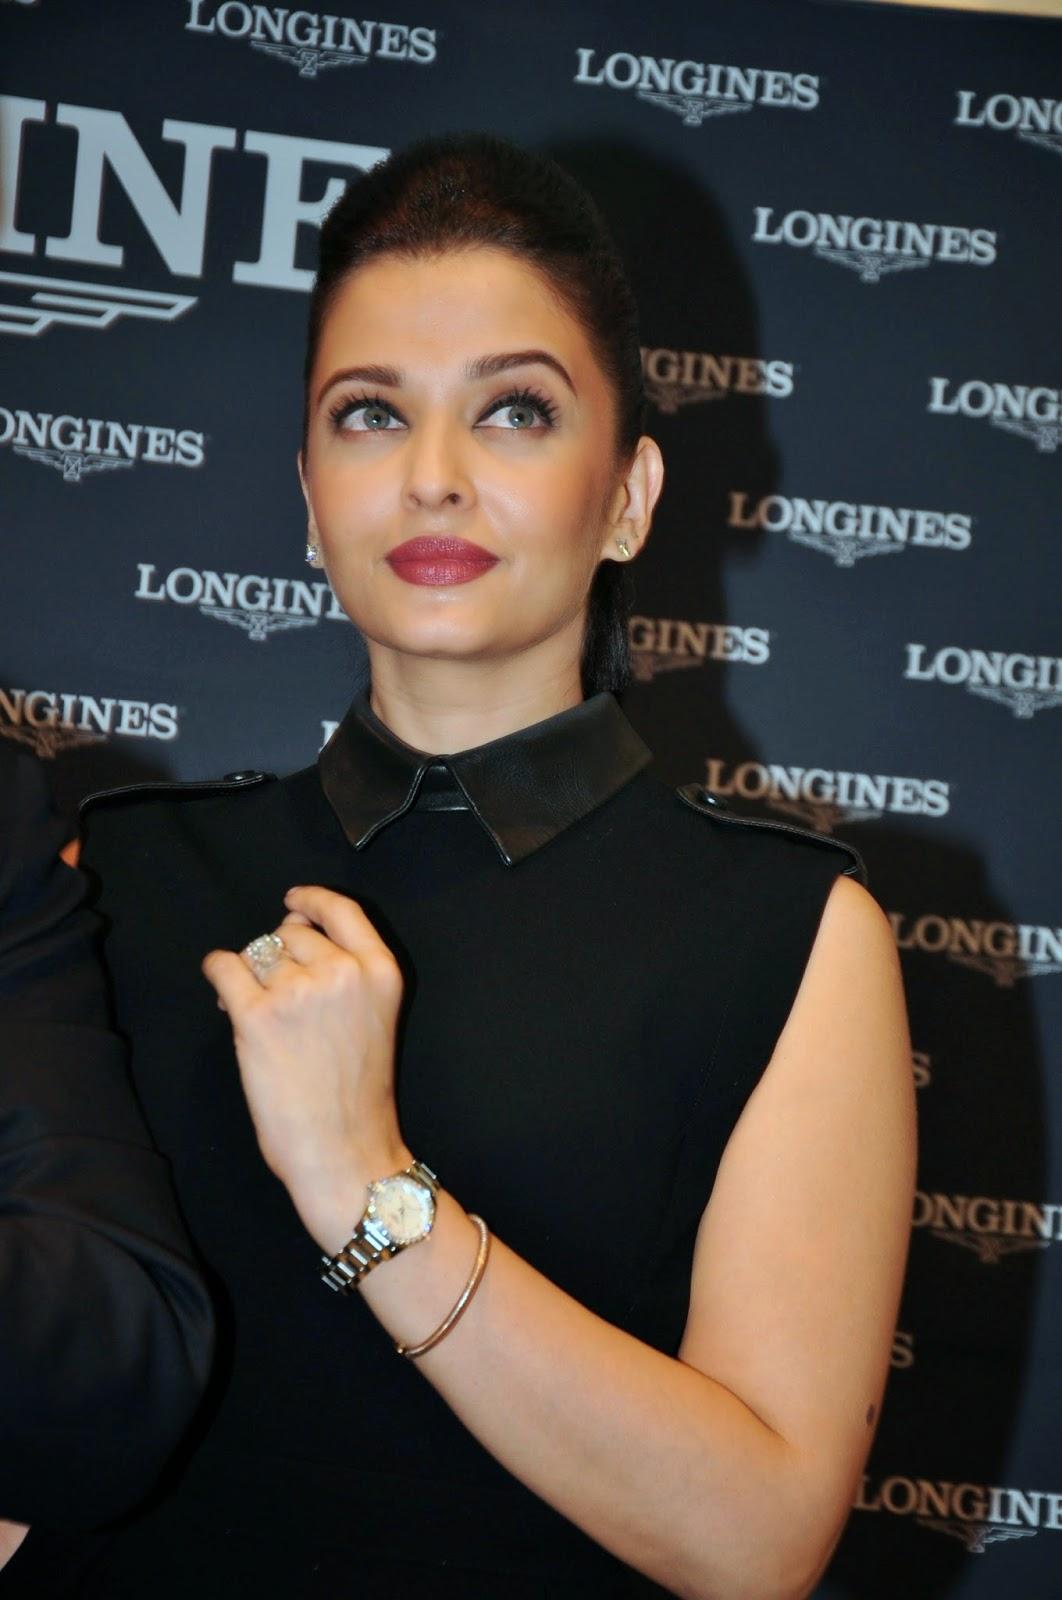 Aishwarya Rai Bachchan Inaugurates Longines Boutique Photos